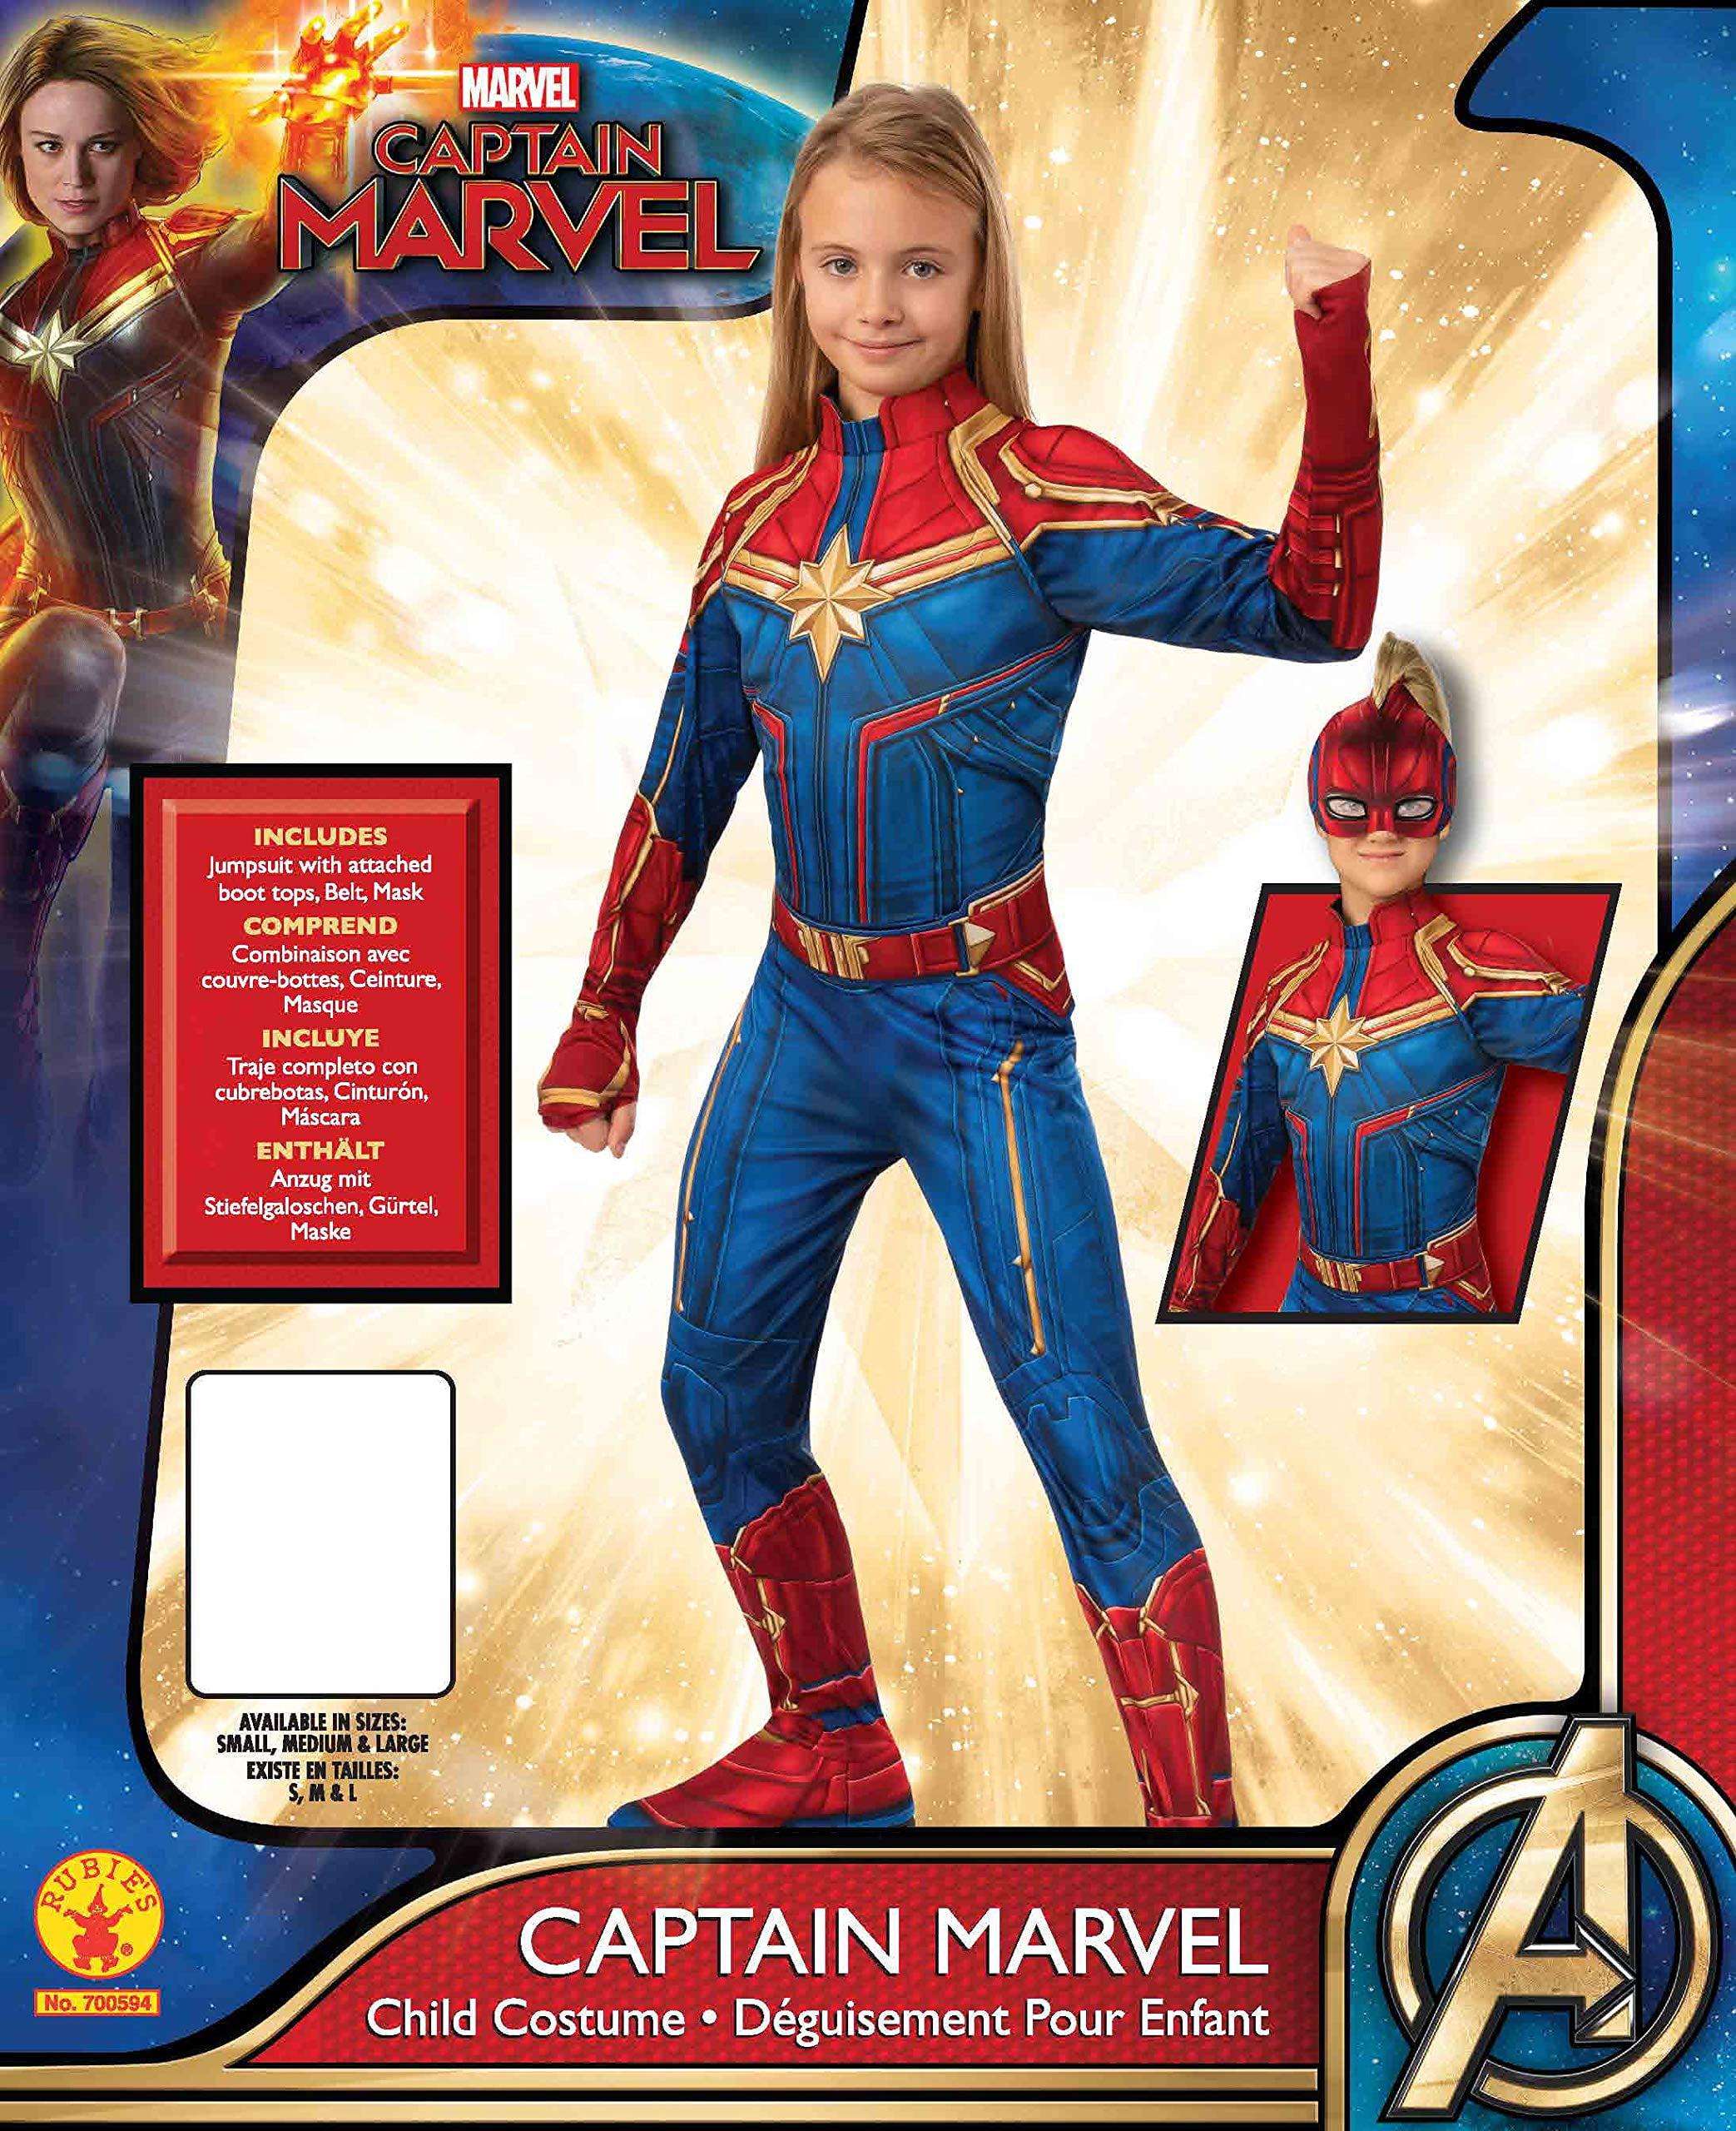 Halloween Avengers Captain Marvel Hero Suit Child Costume Walmart Com Walmart Com Captain marvel (brie larson) is the superhero identity of carol danvers, a former u.s. halloween avengers captain marvel hero suit child costume